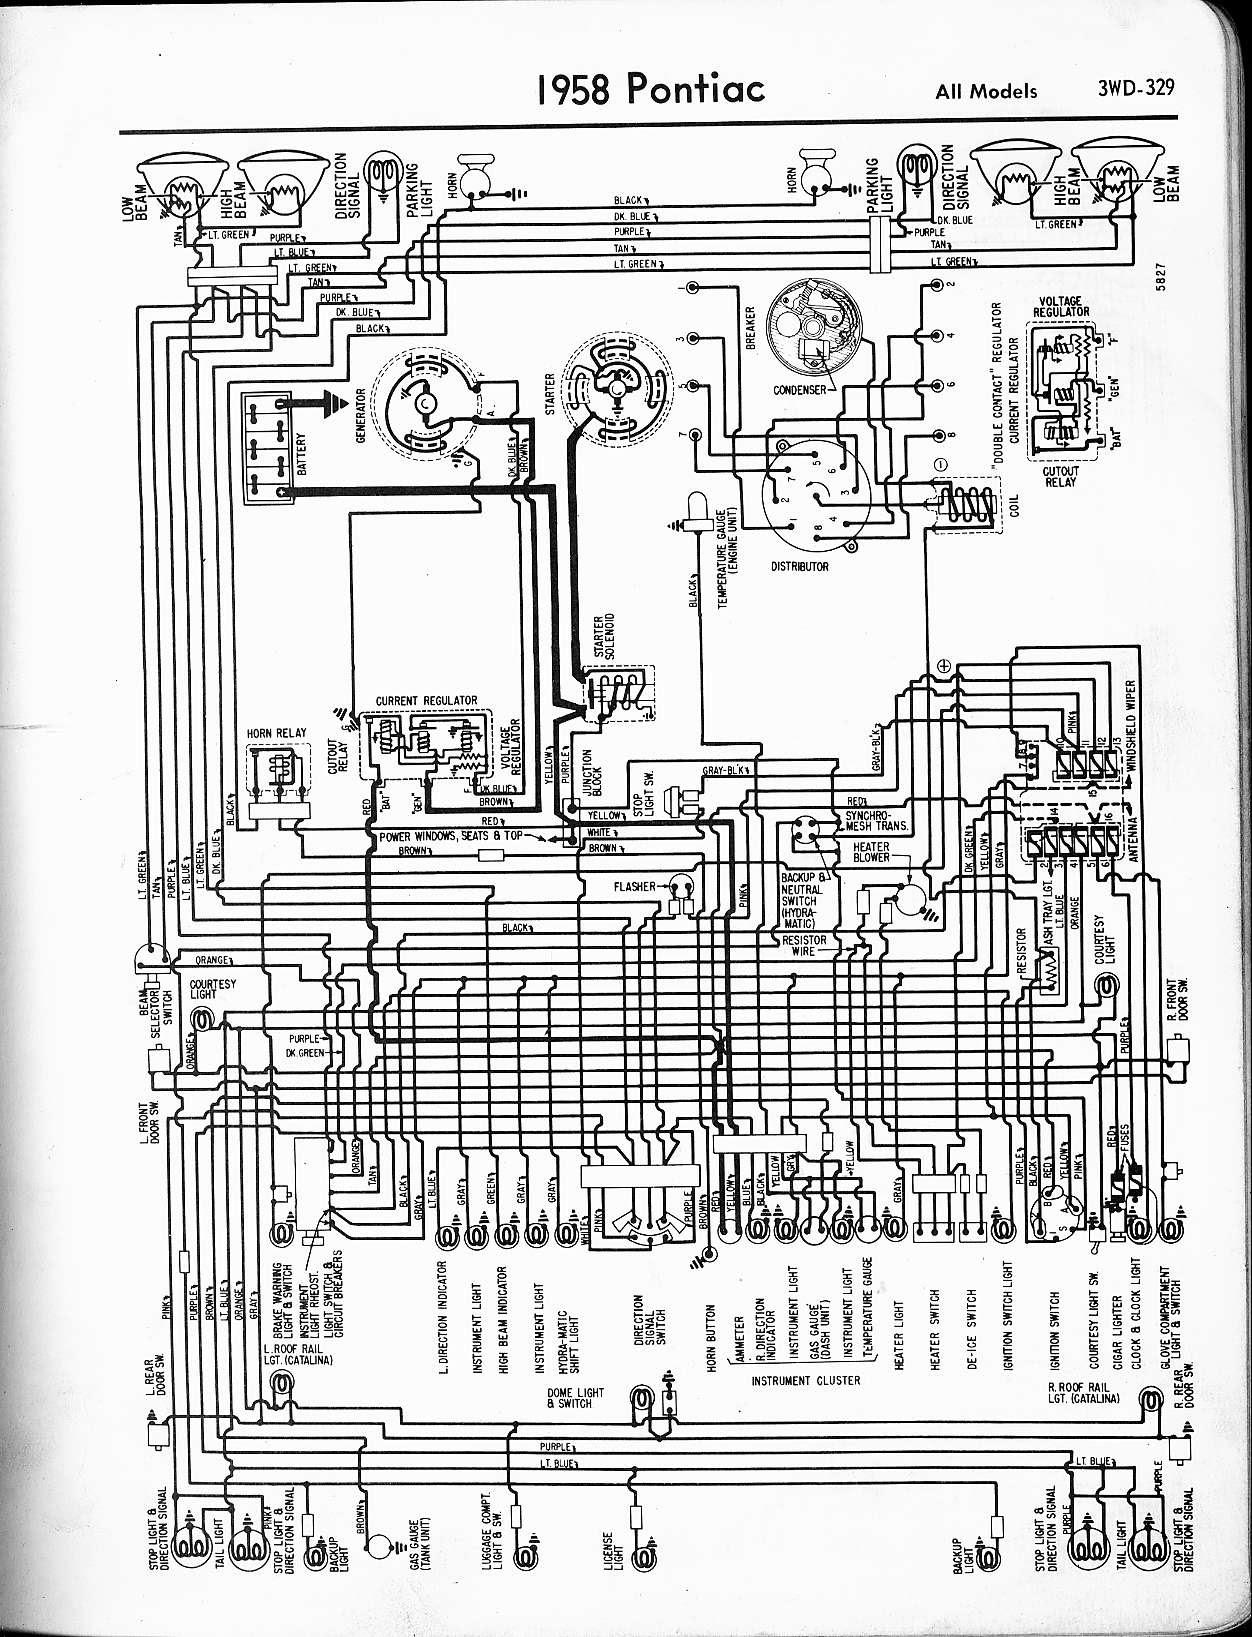 1968 Pontiac Bonneville Wiring Diagram